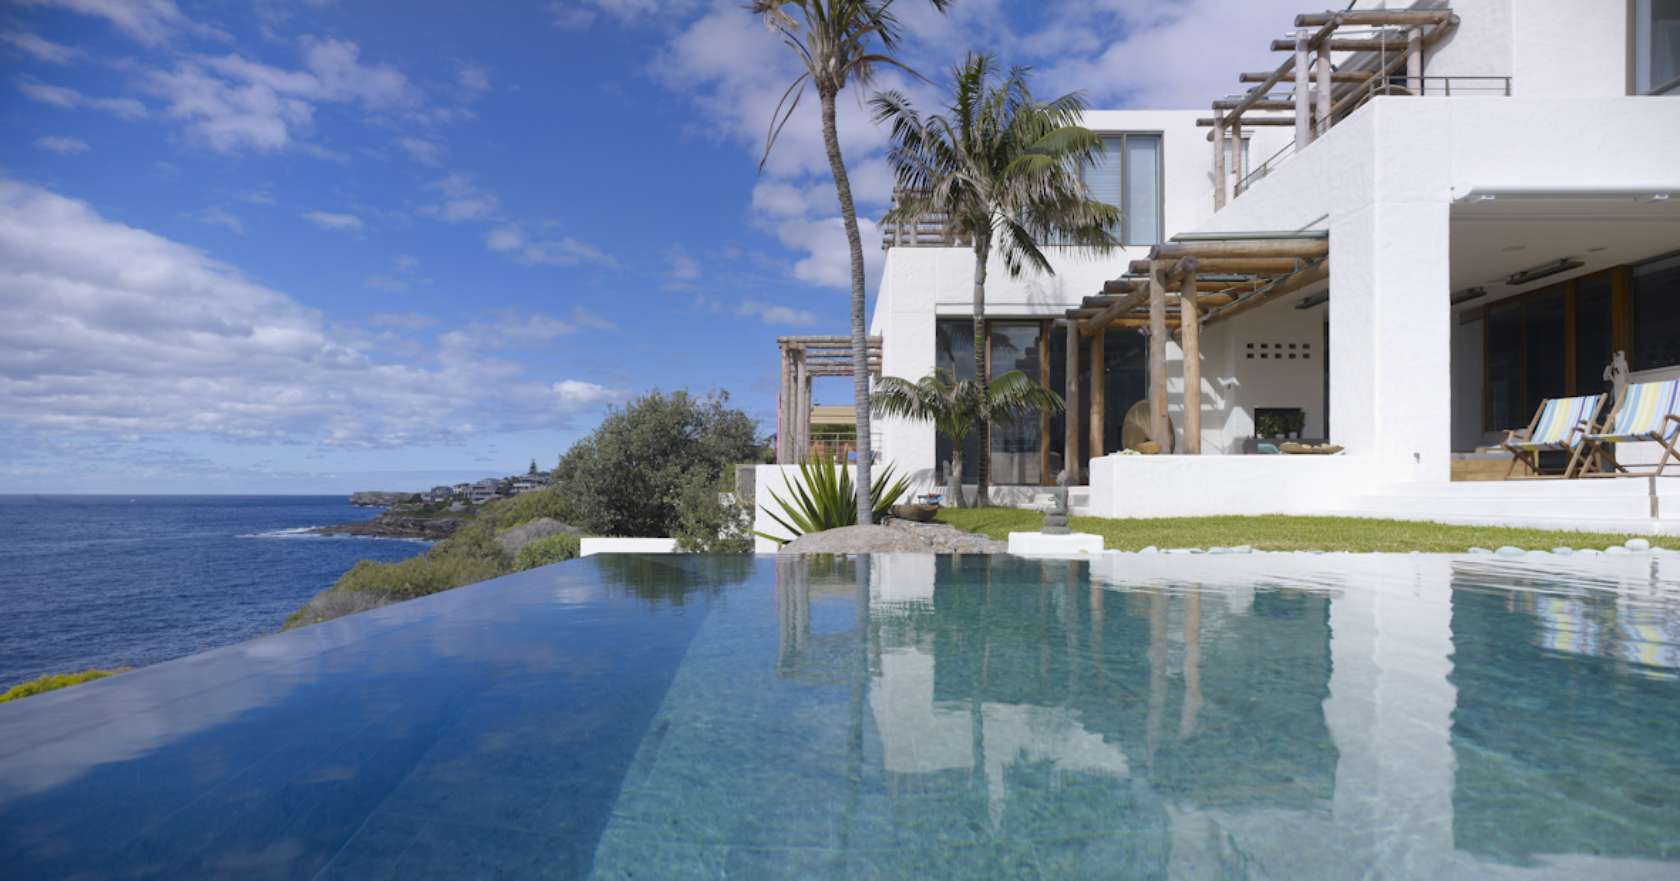 Casa em estilo santa Fé com piscina de borda infinita na costa